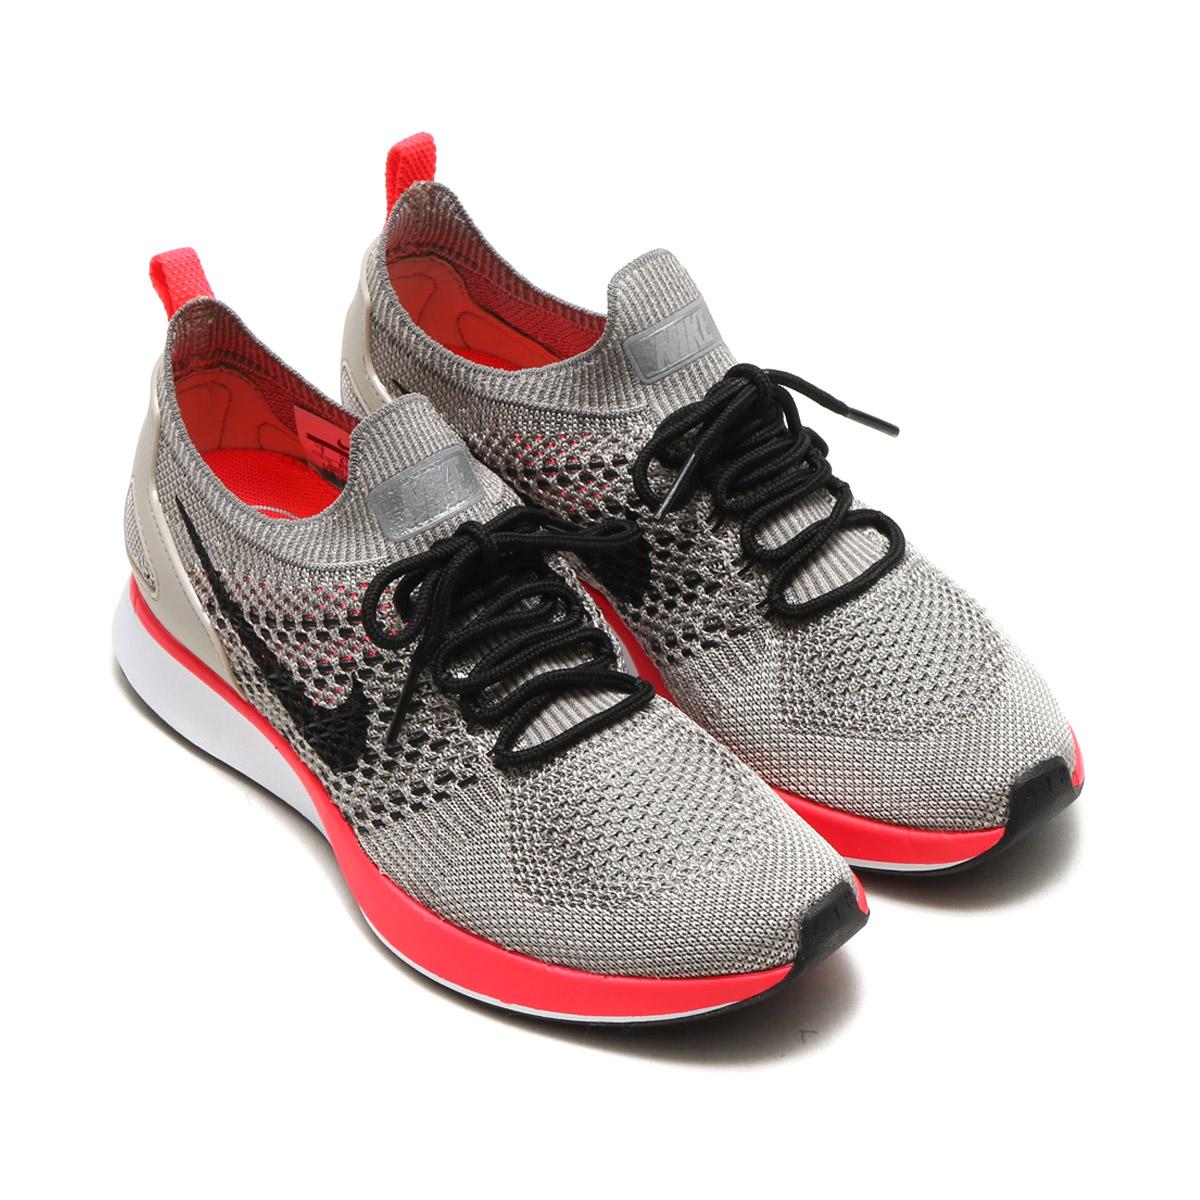 61541c5034f7 Nike Mariah Flyknit Racer String (W) - 1